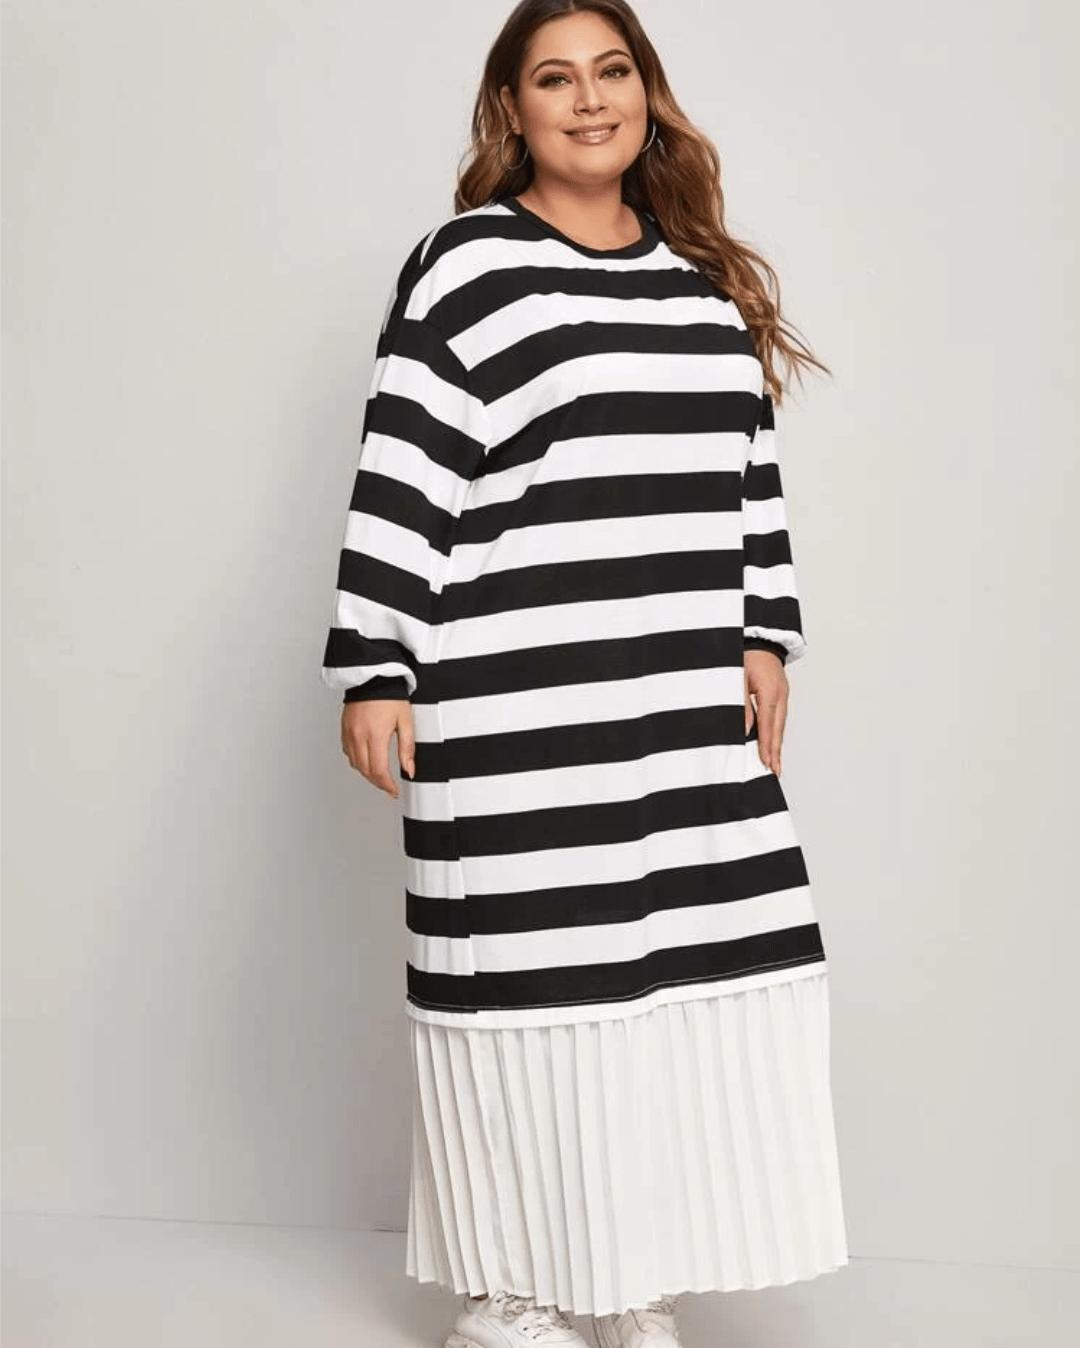 Image of Ballon Sleeve Pleated Hem Flounce Hem Two Tone Striped Dress